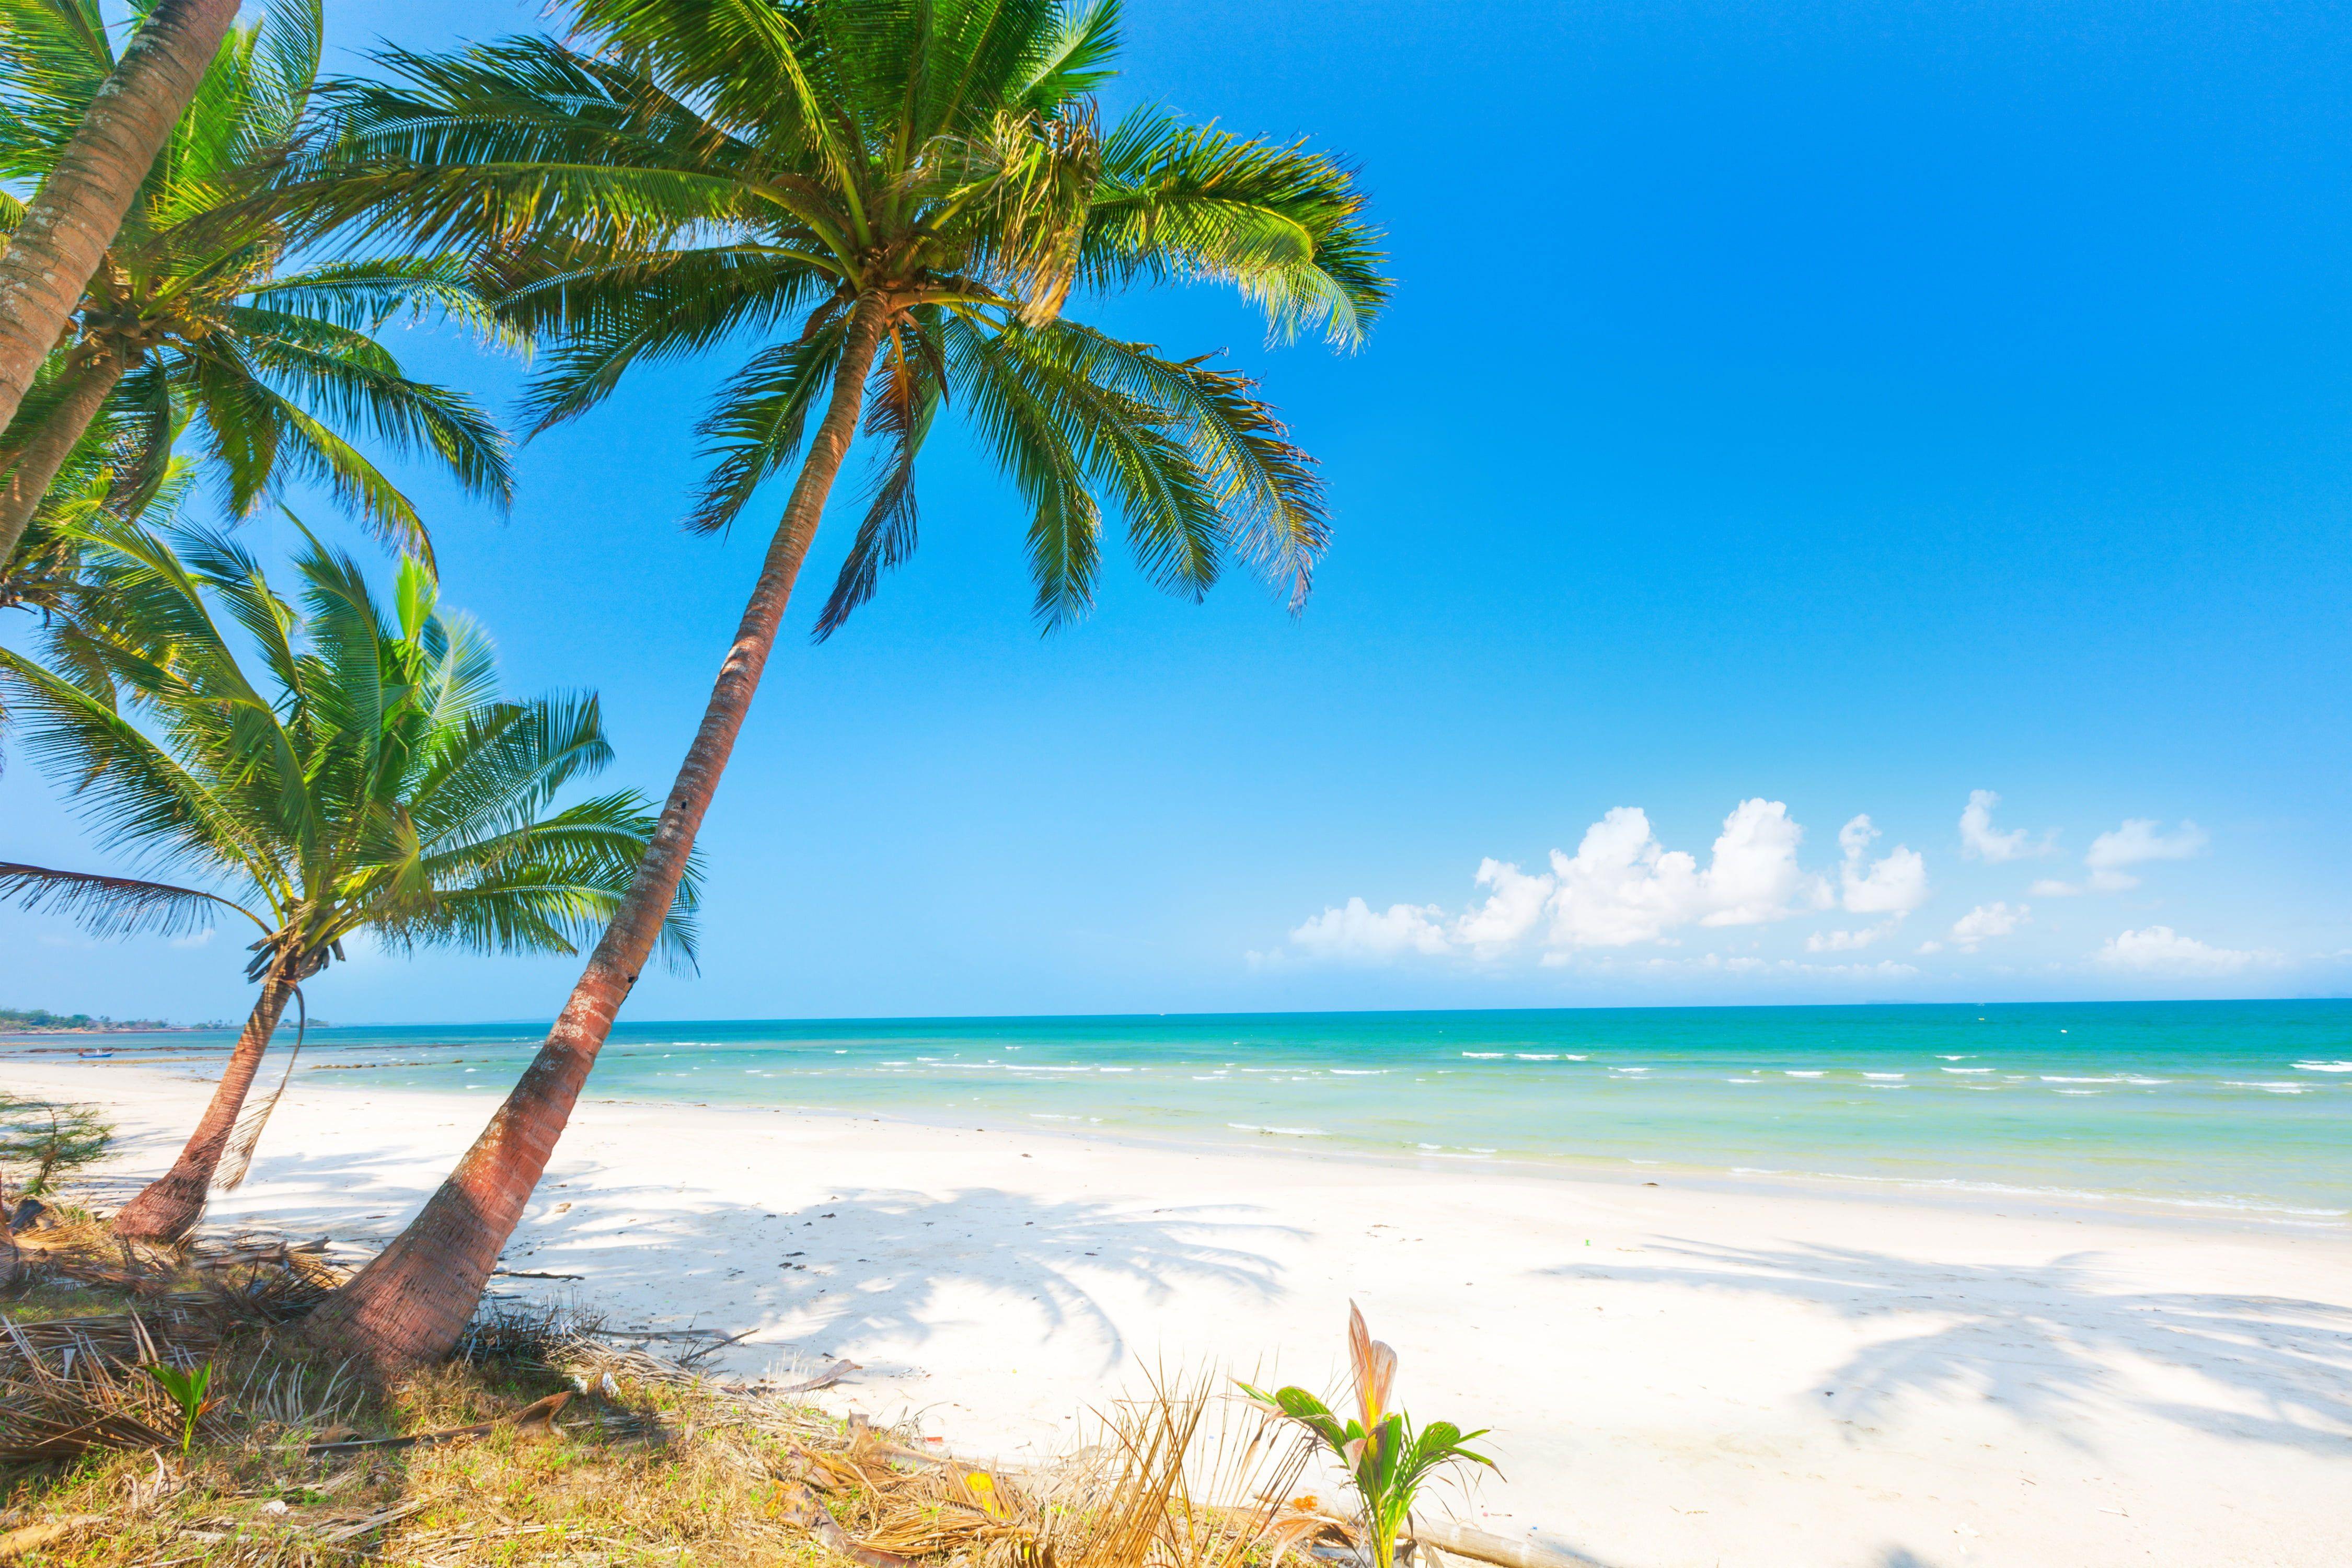 Wallpaper Palm Tree Sand Sea Beach The Sun Palm Trees In 2021 Palm Trees Wallpaper Palm Trees Beach Palm Trees Tropical island beach palm sea sand